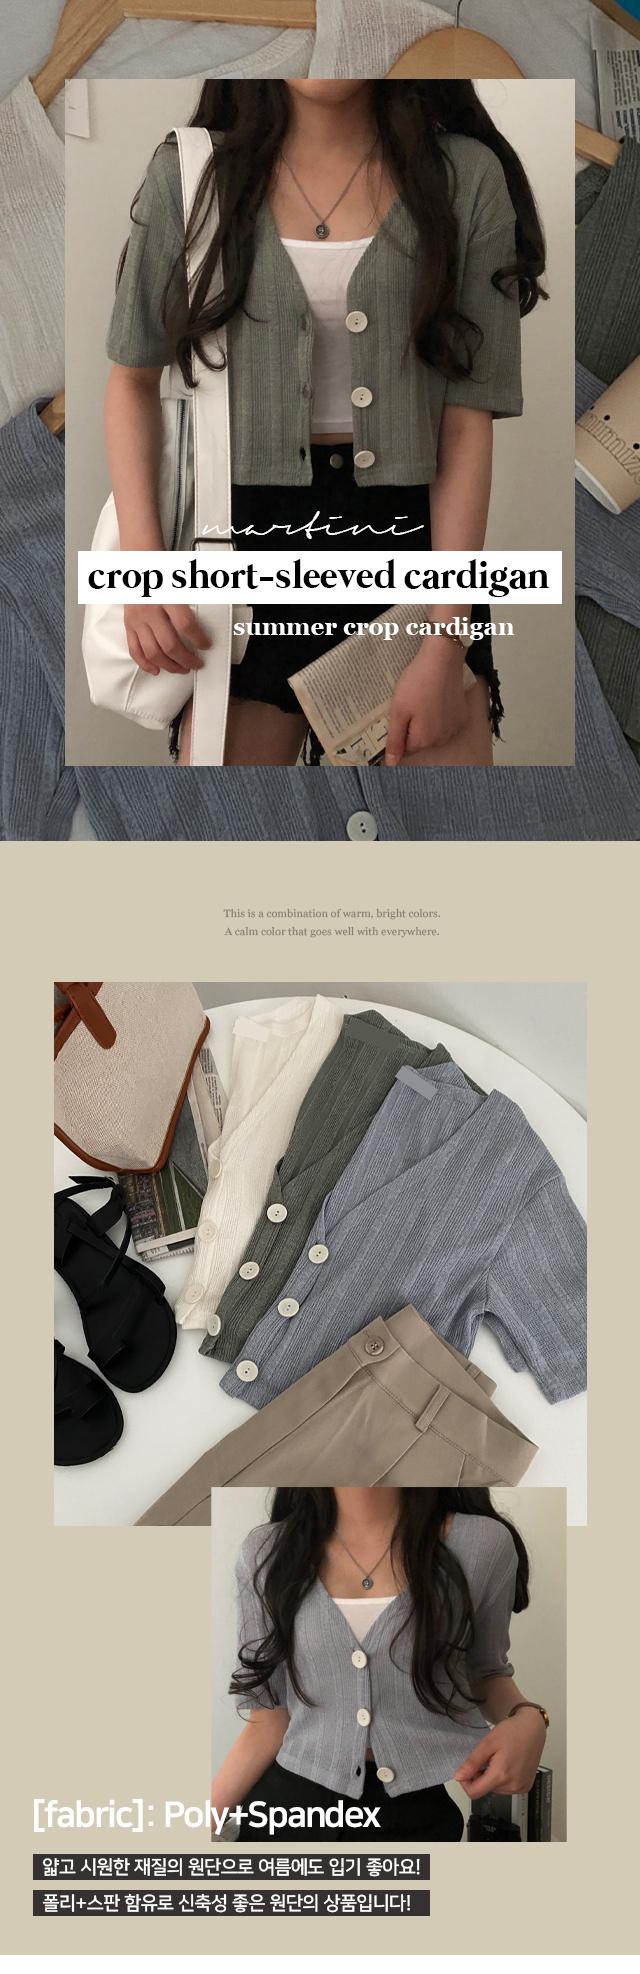 Martini cropped Ribbed short-sleeved cardigan